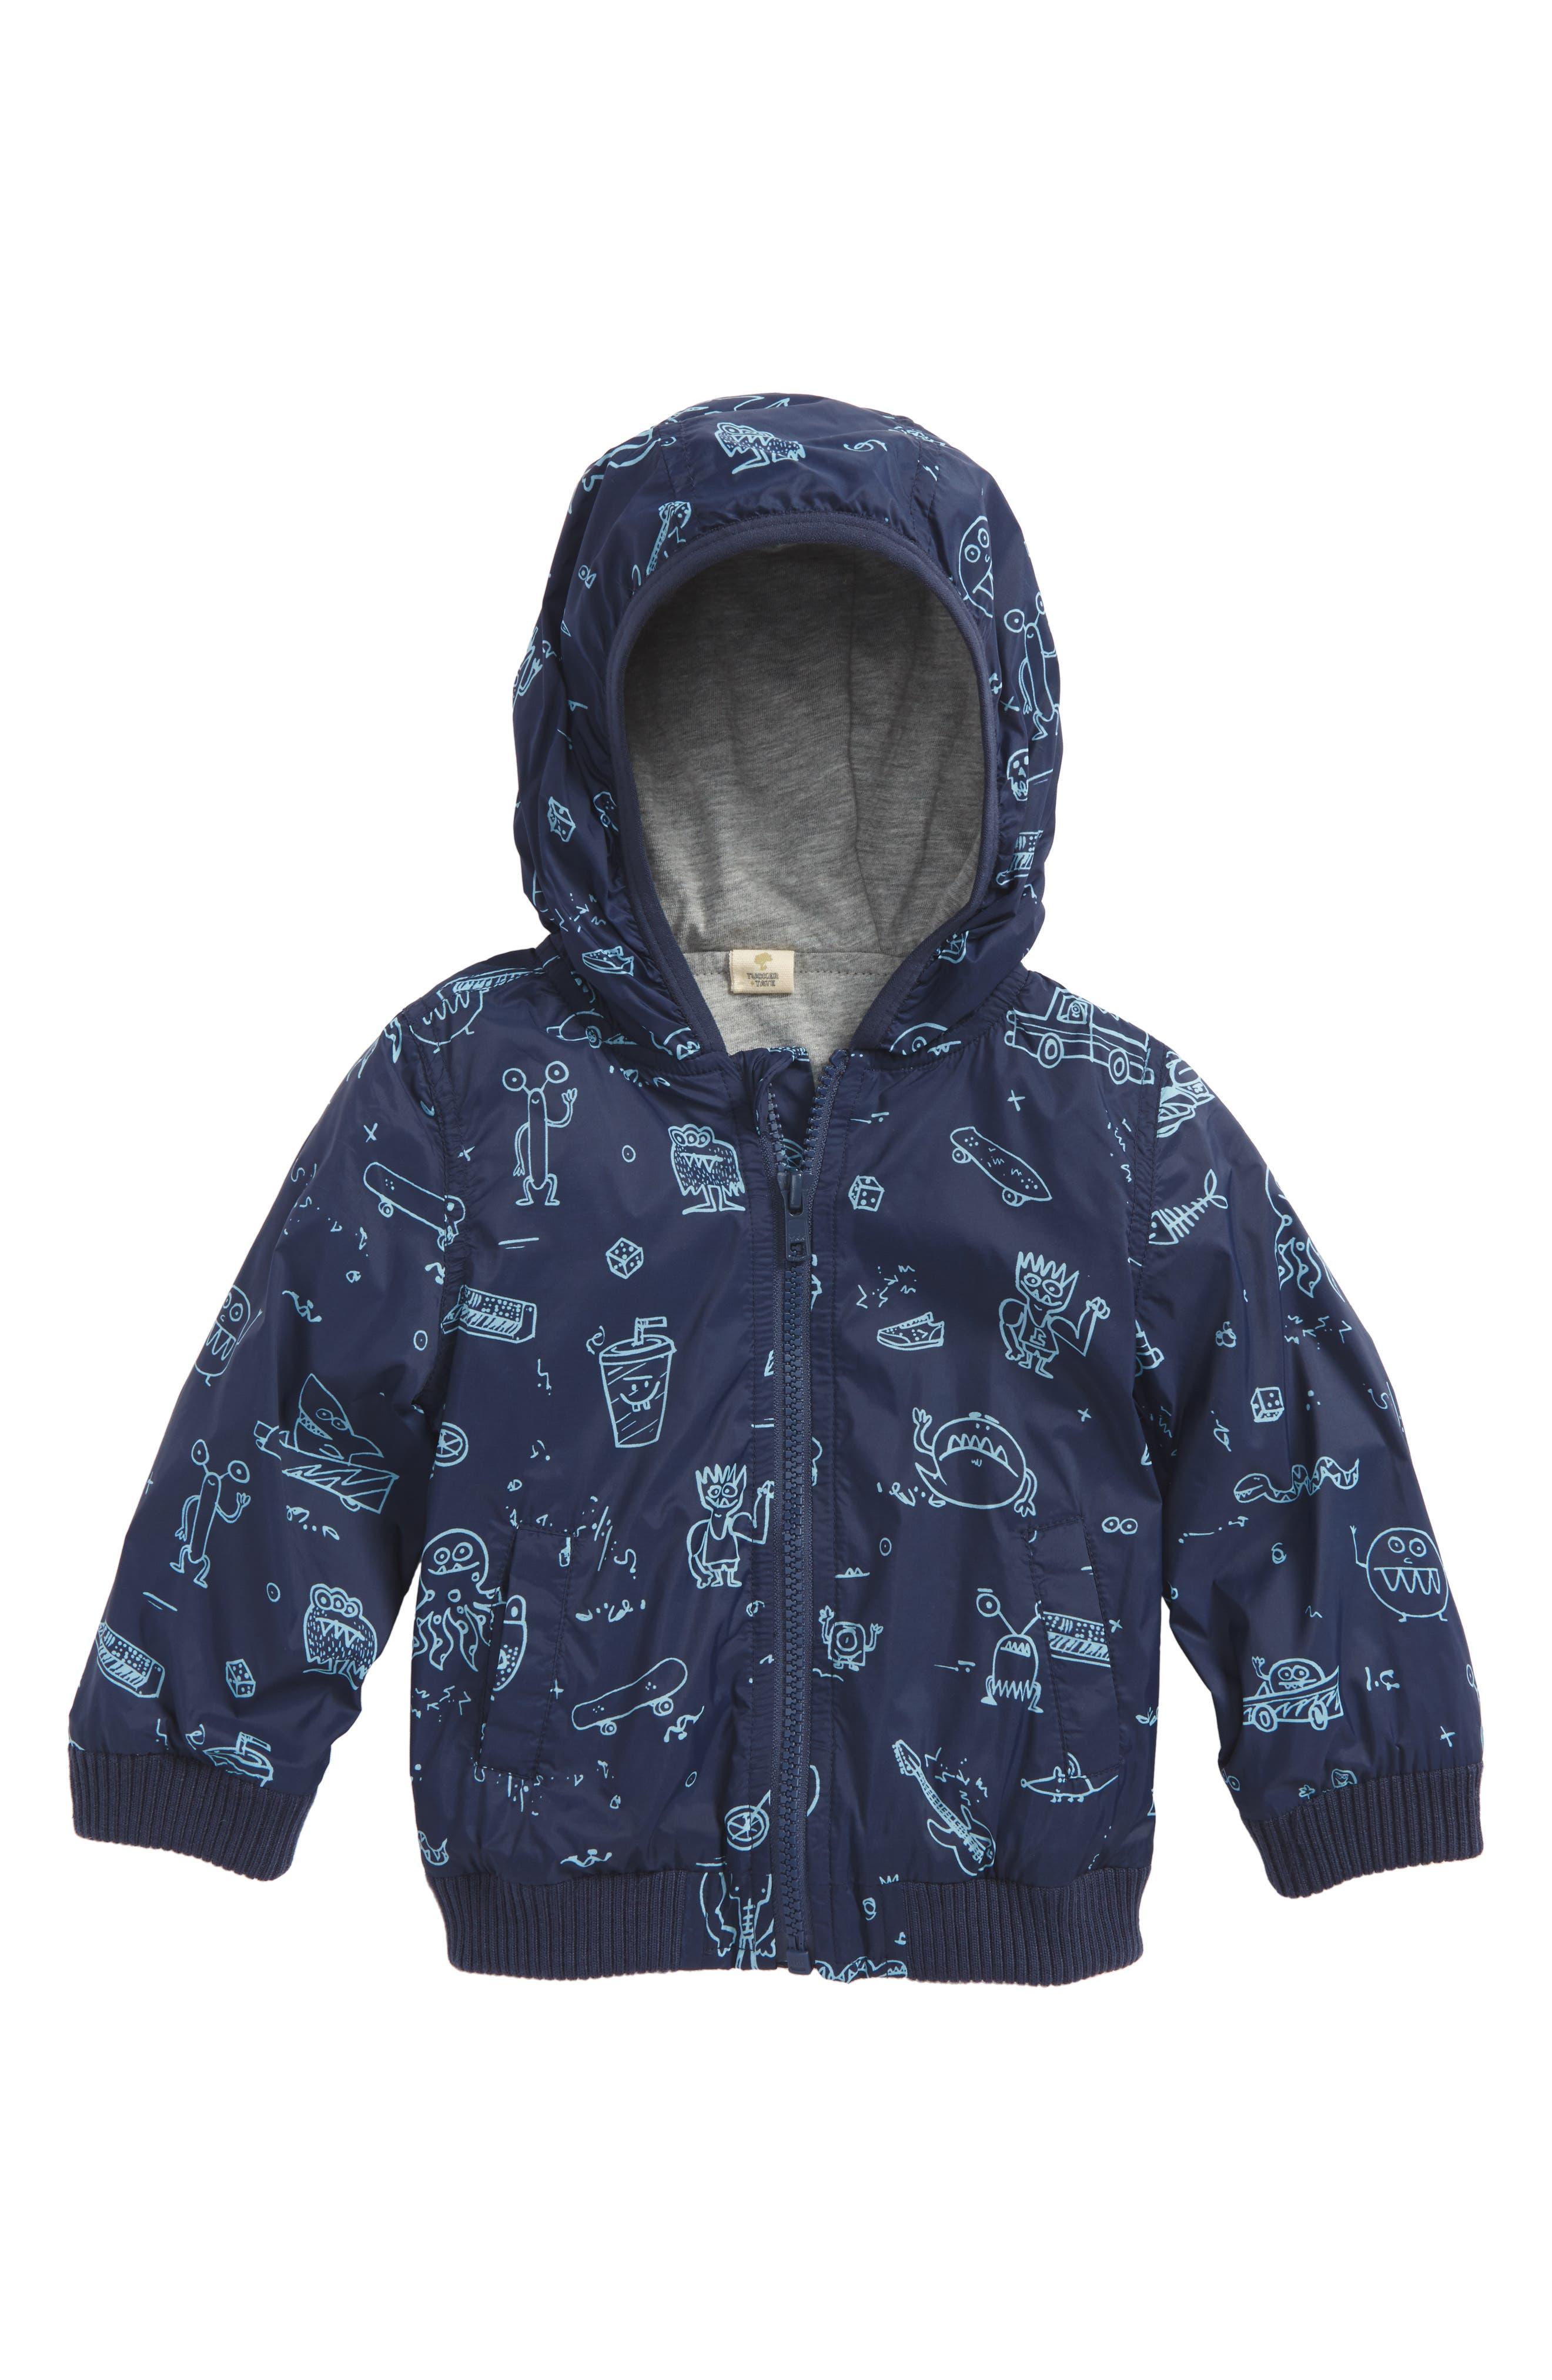 Hooded Jacket,                             Main thumbnail 1, color,                             Navy Denim Doodle